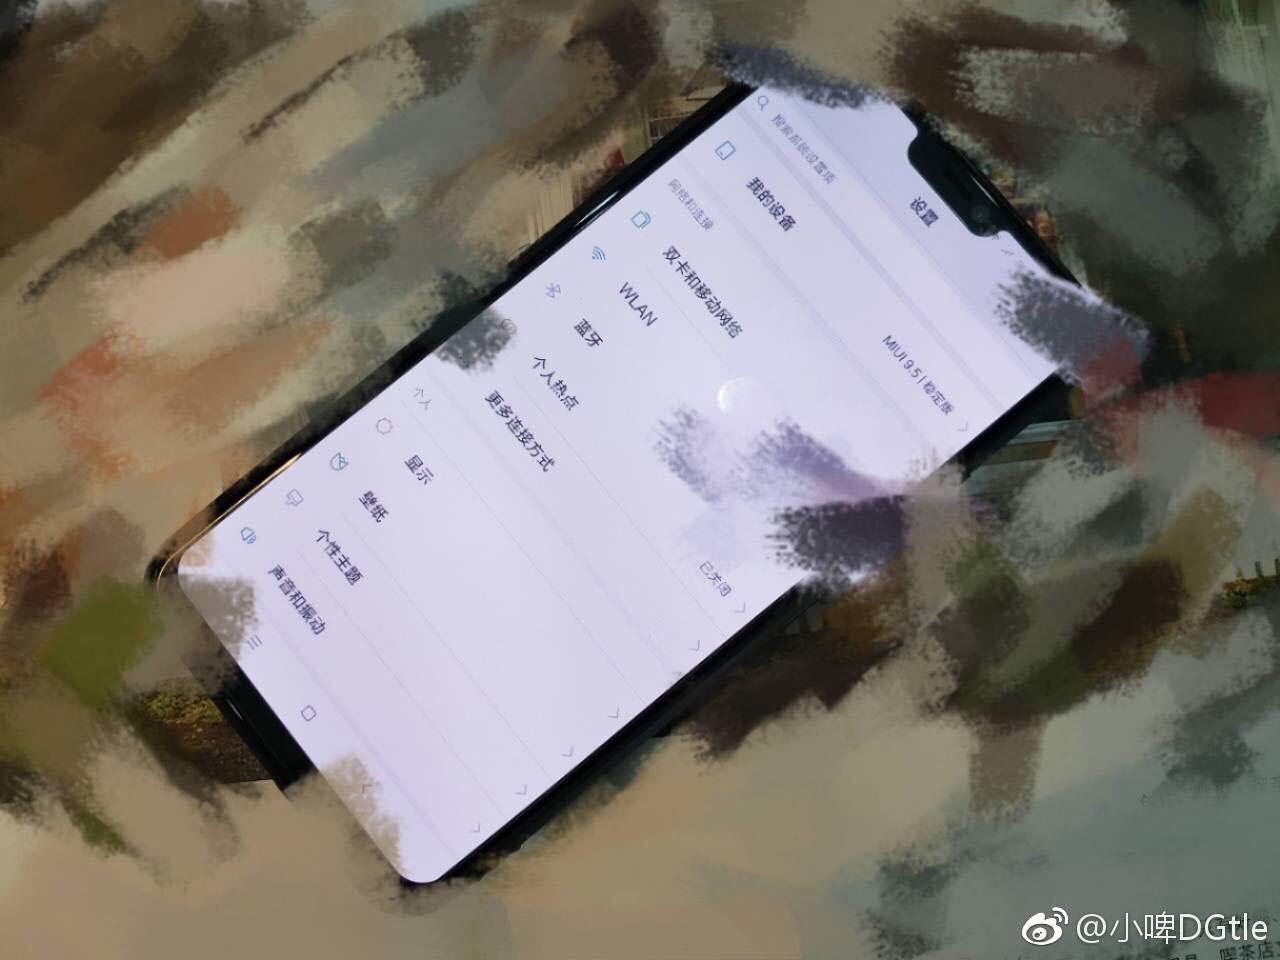 Xiaomi MI 7 slike izlazak